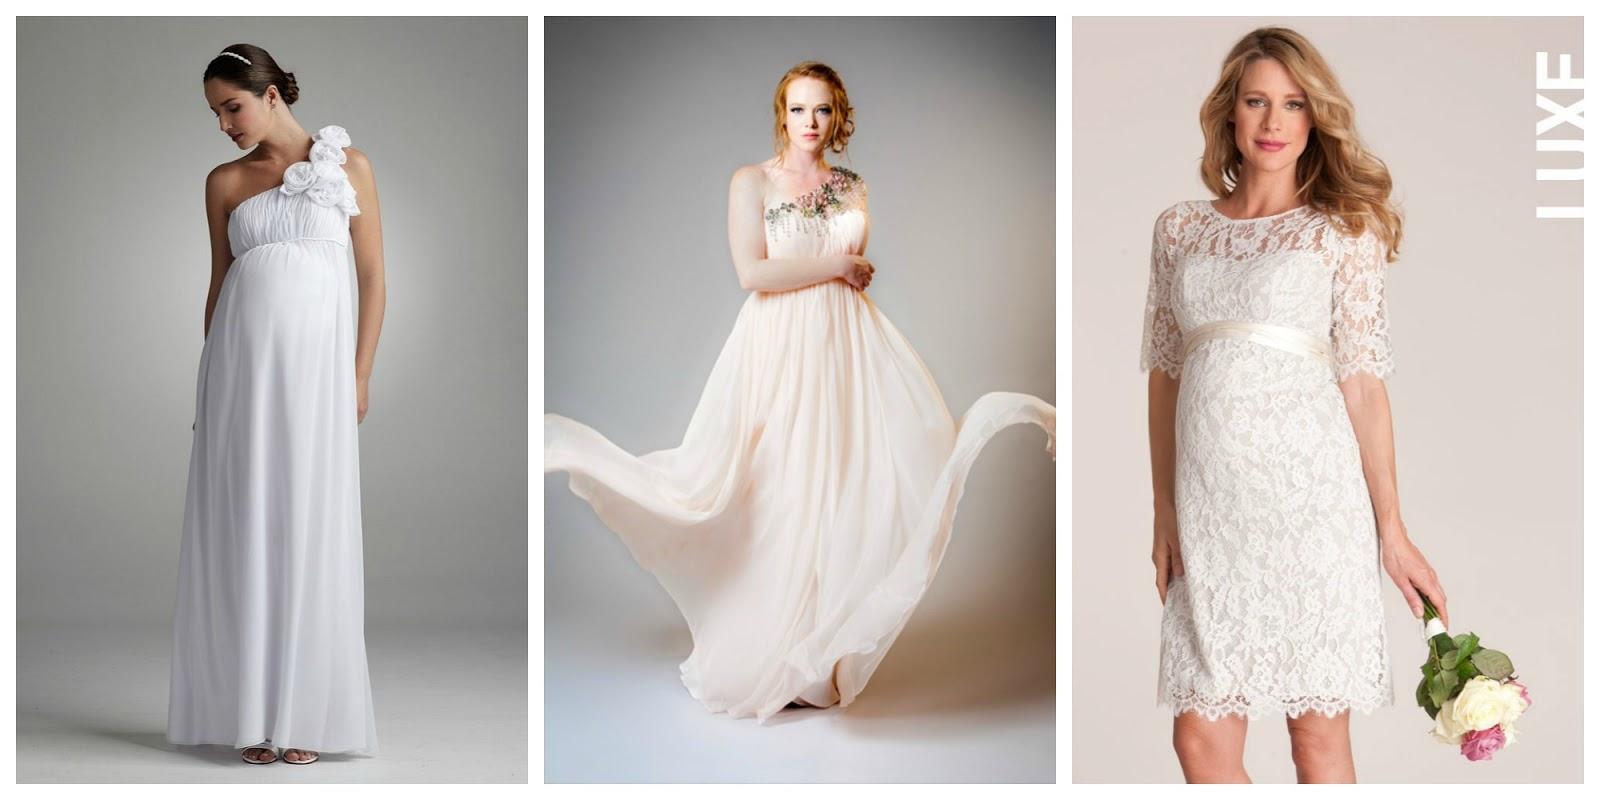 Wedding Wednesday: Maternity Wedding Fashion (Guest Post